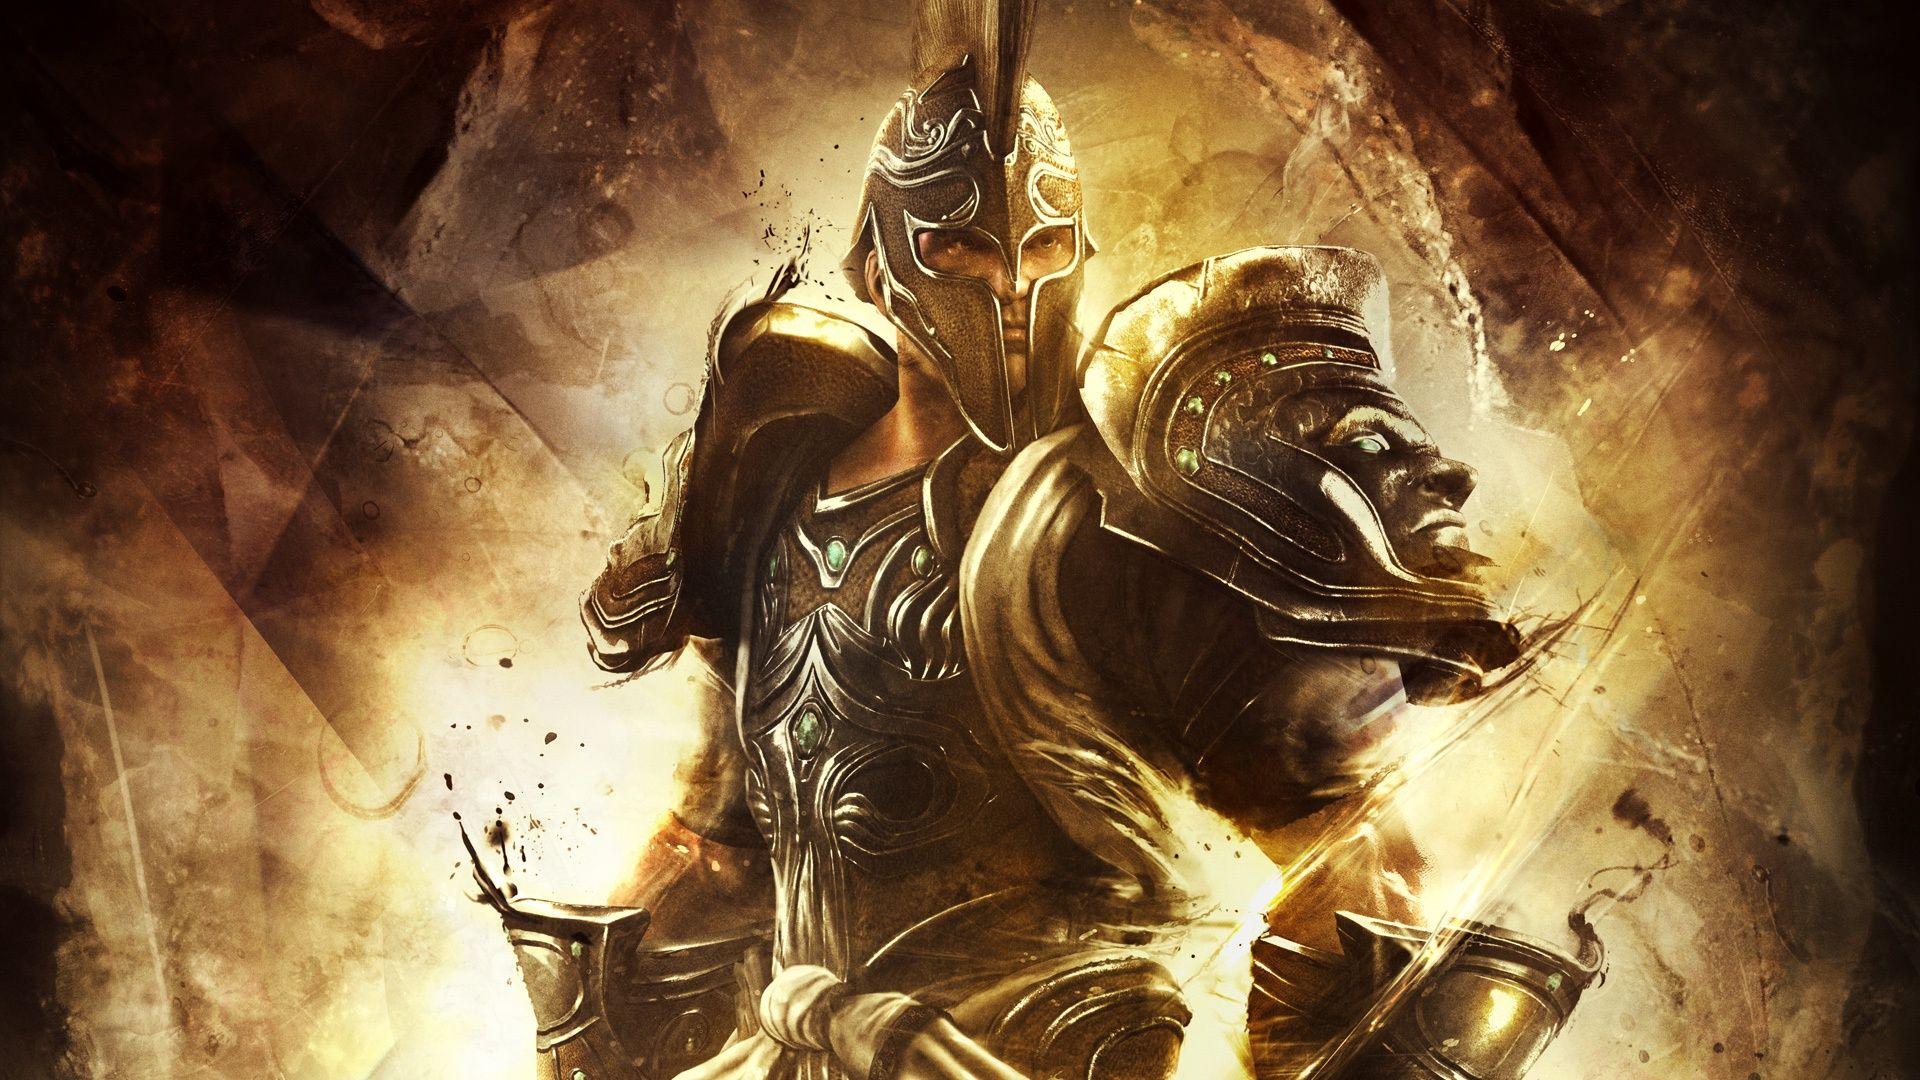 God of War Trojan 1080p HD Wallpaper Games God of war